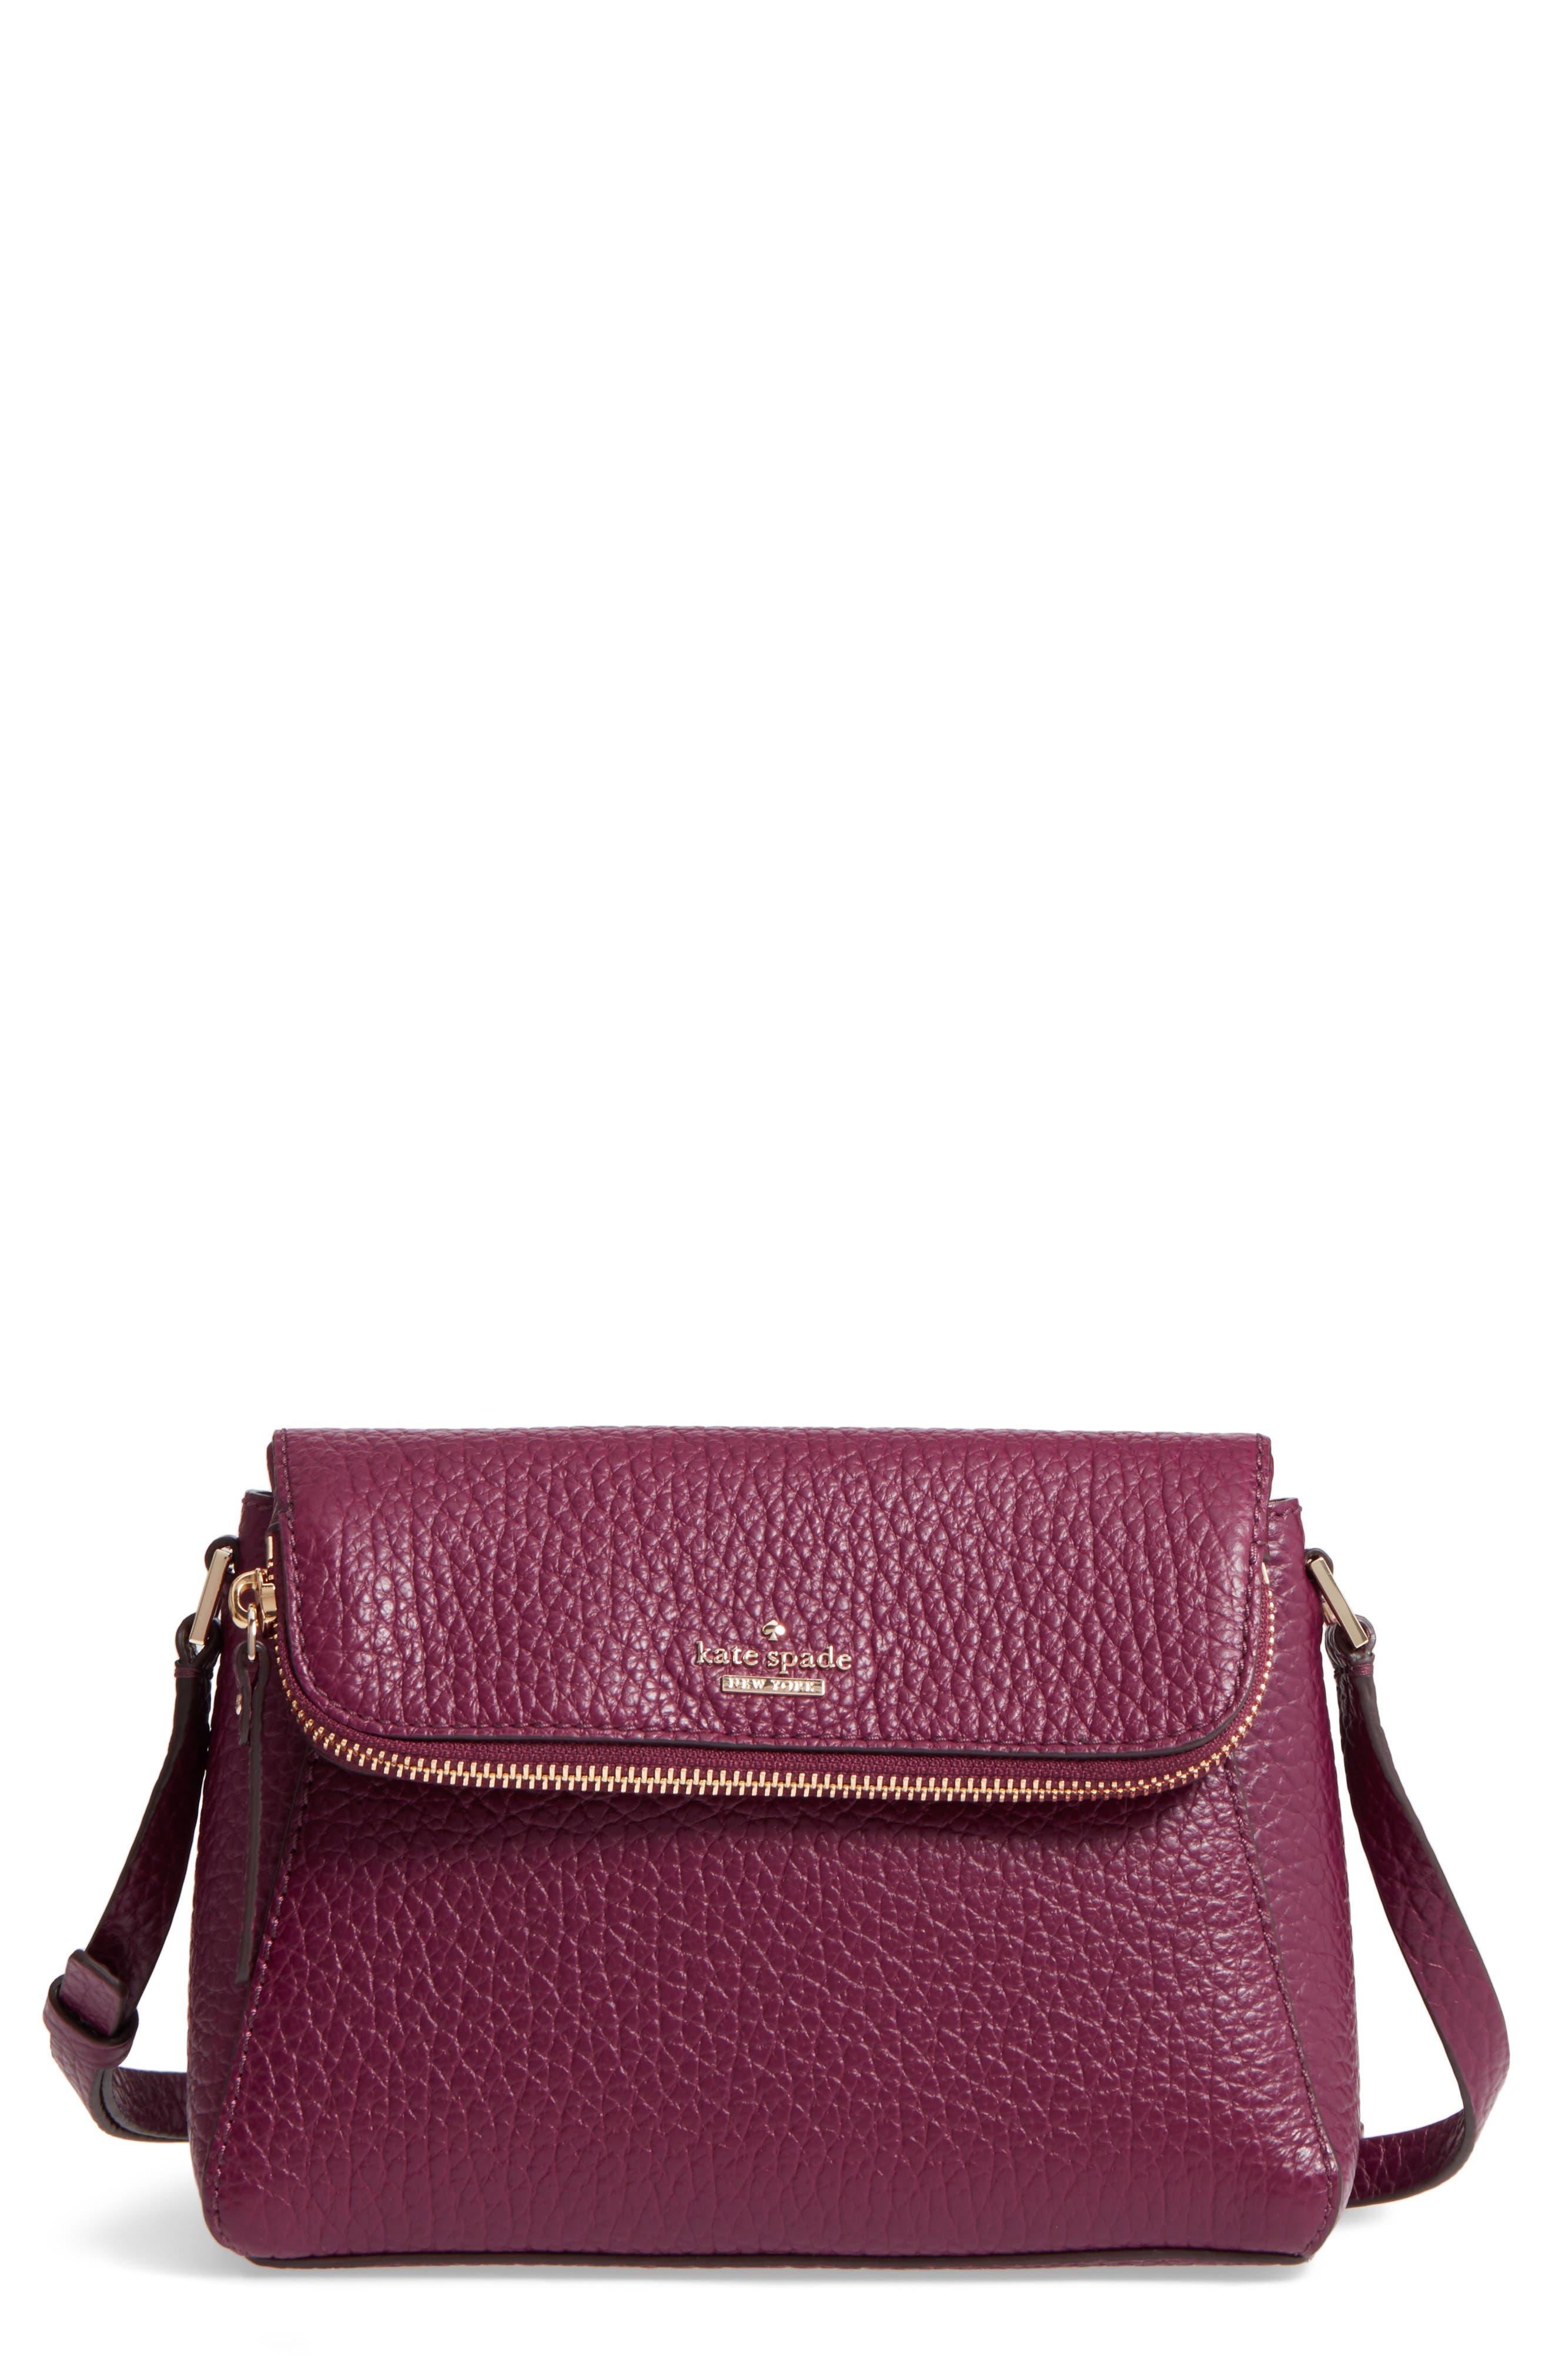 carter street - berrin leather crossbody bag,                             Main thumbnail 1, color,                             Plum